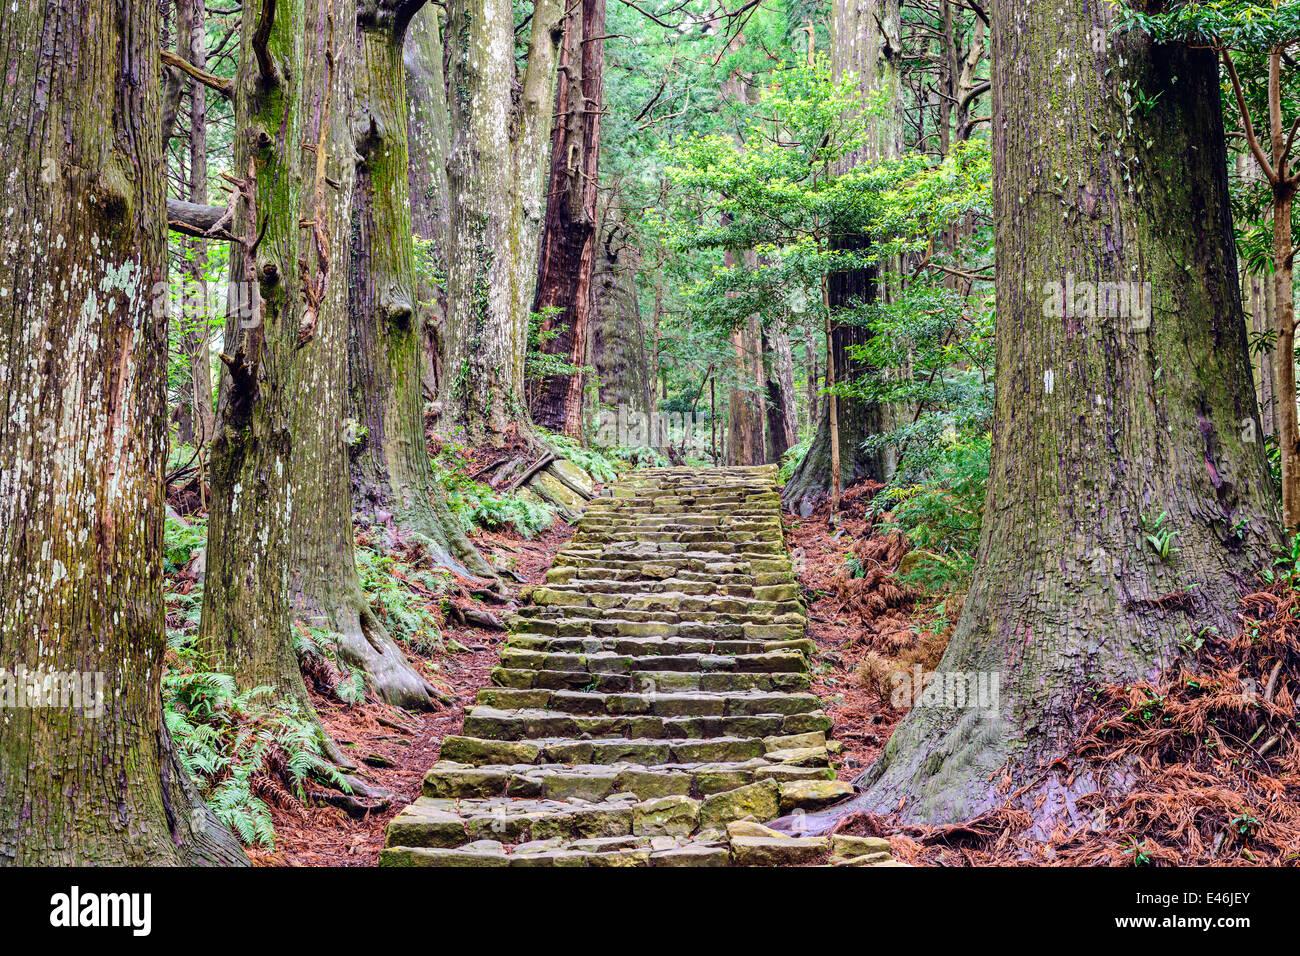 Kumano Kodo am Daimon-Zaka, eine heilige Spur als UNESCO-Weltkulturerbe in Nachi, Wakayama, Japan. Stockbild